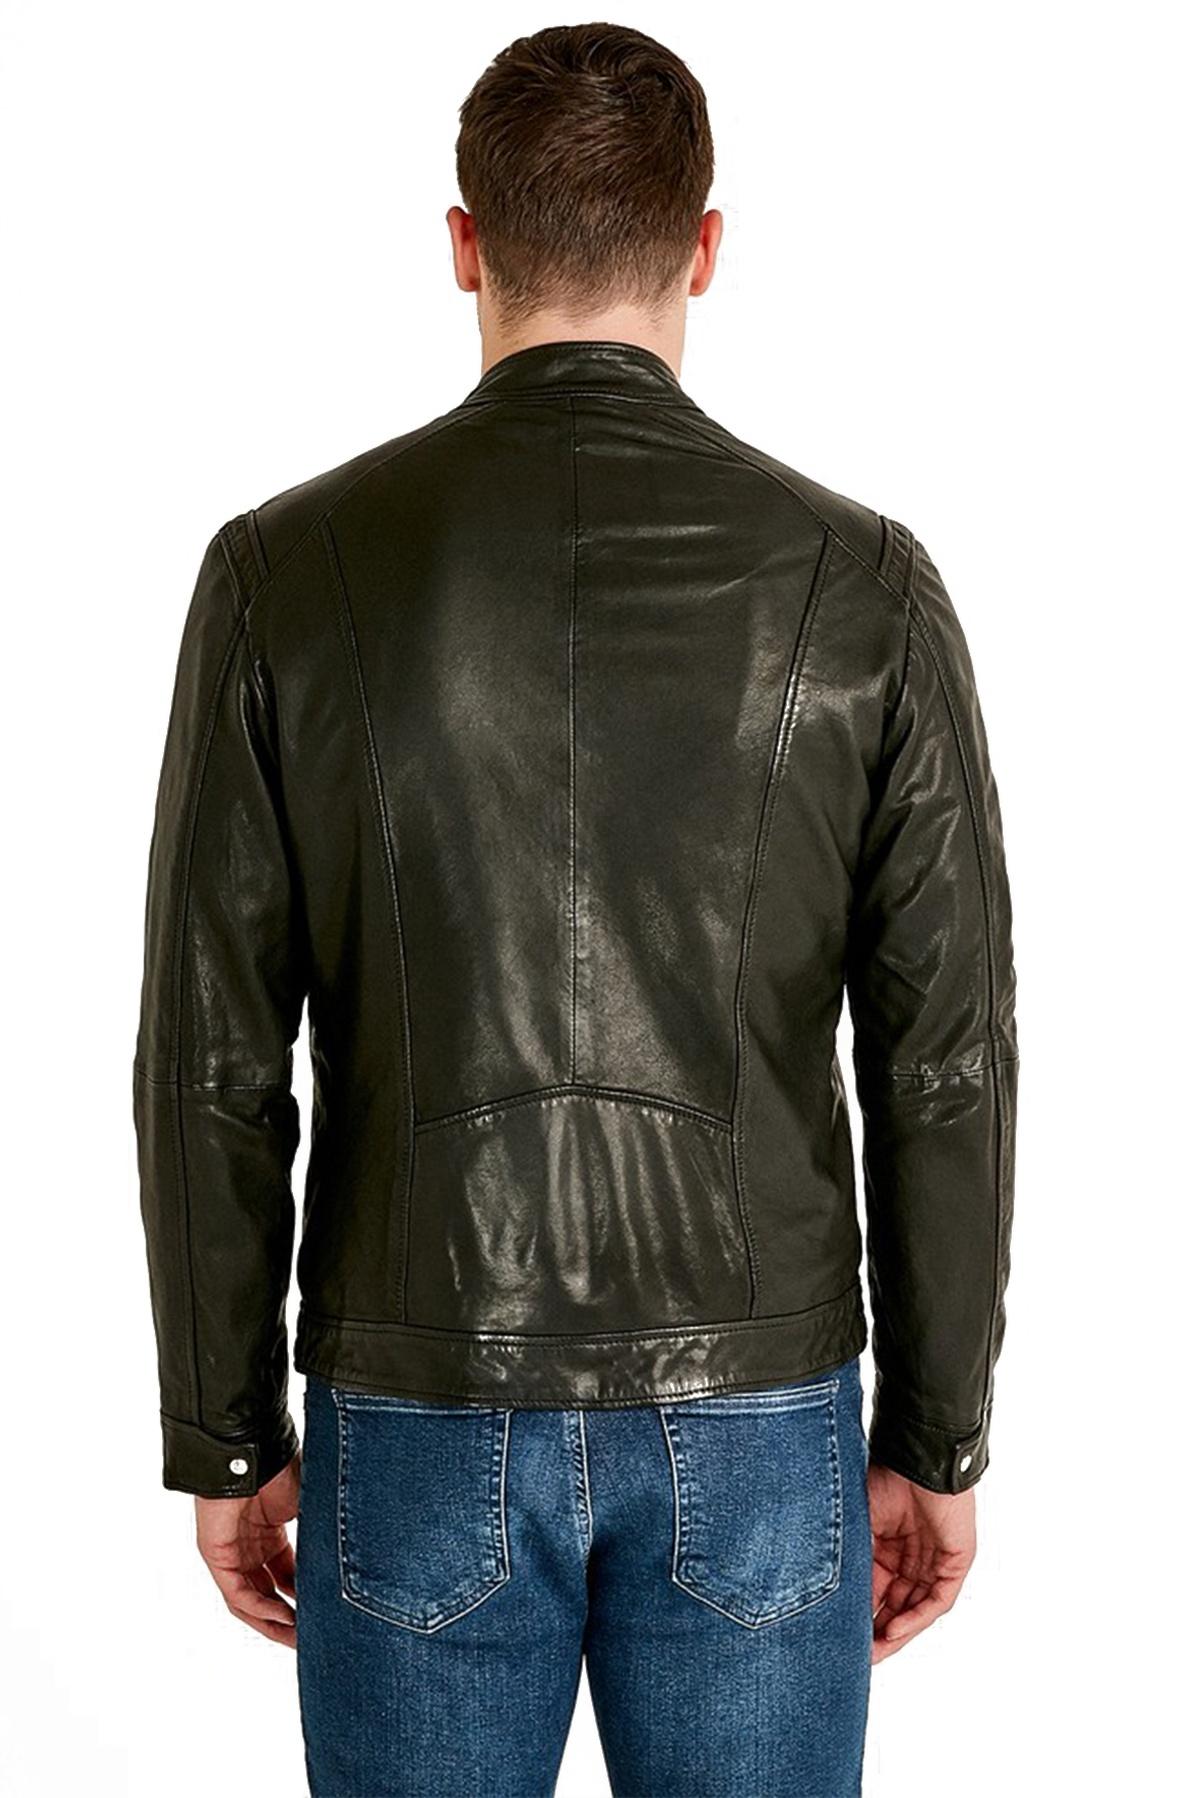 Best westbrook leather jacket